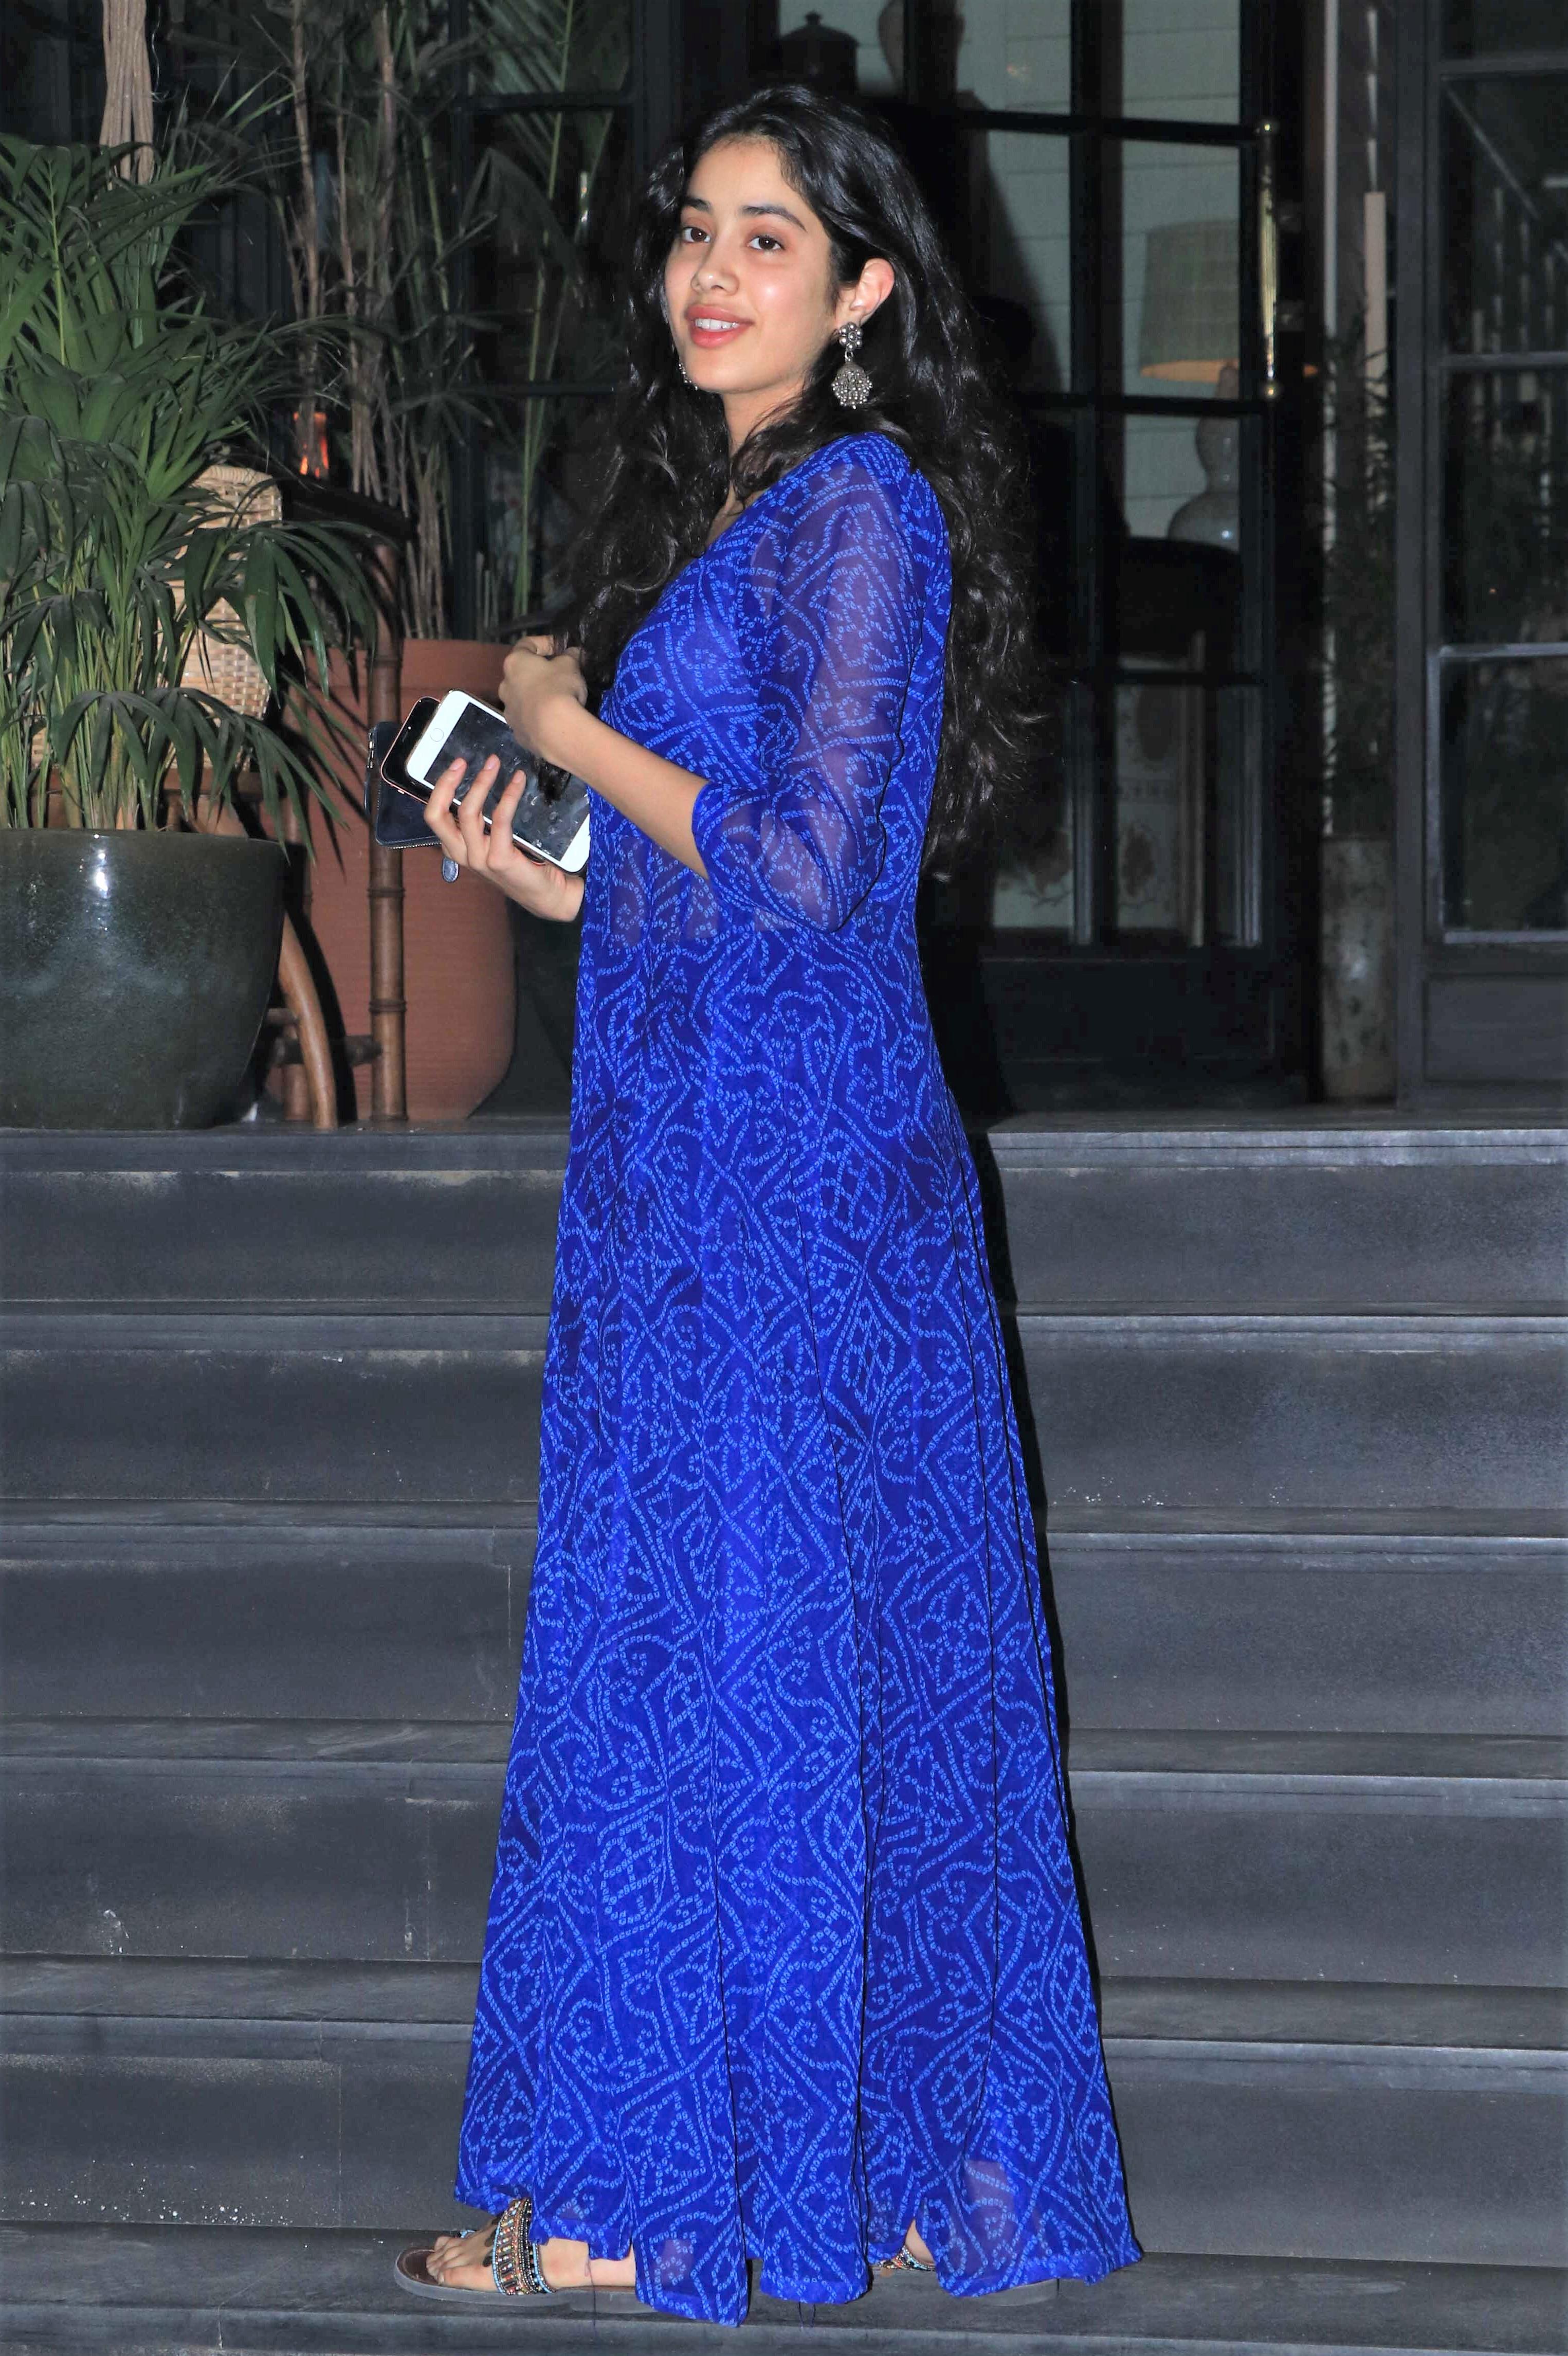 Star Spotting: Deepika Padukone Looks Stunning In White, Aditya Roy Kapoor Goes To the Gym and Aishwarya Rai Bachchan Snapped!